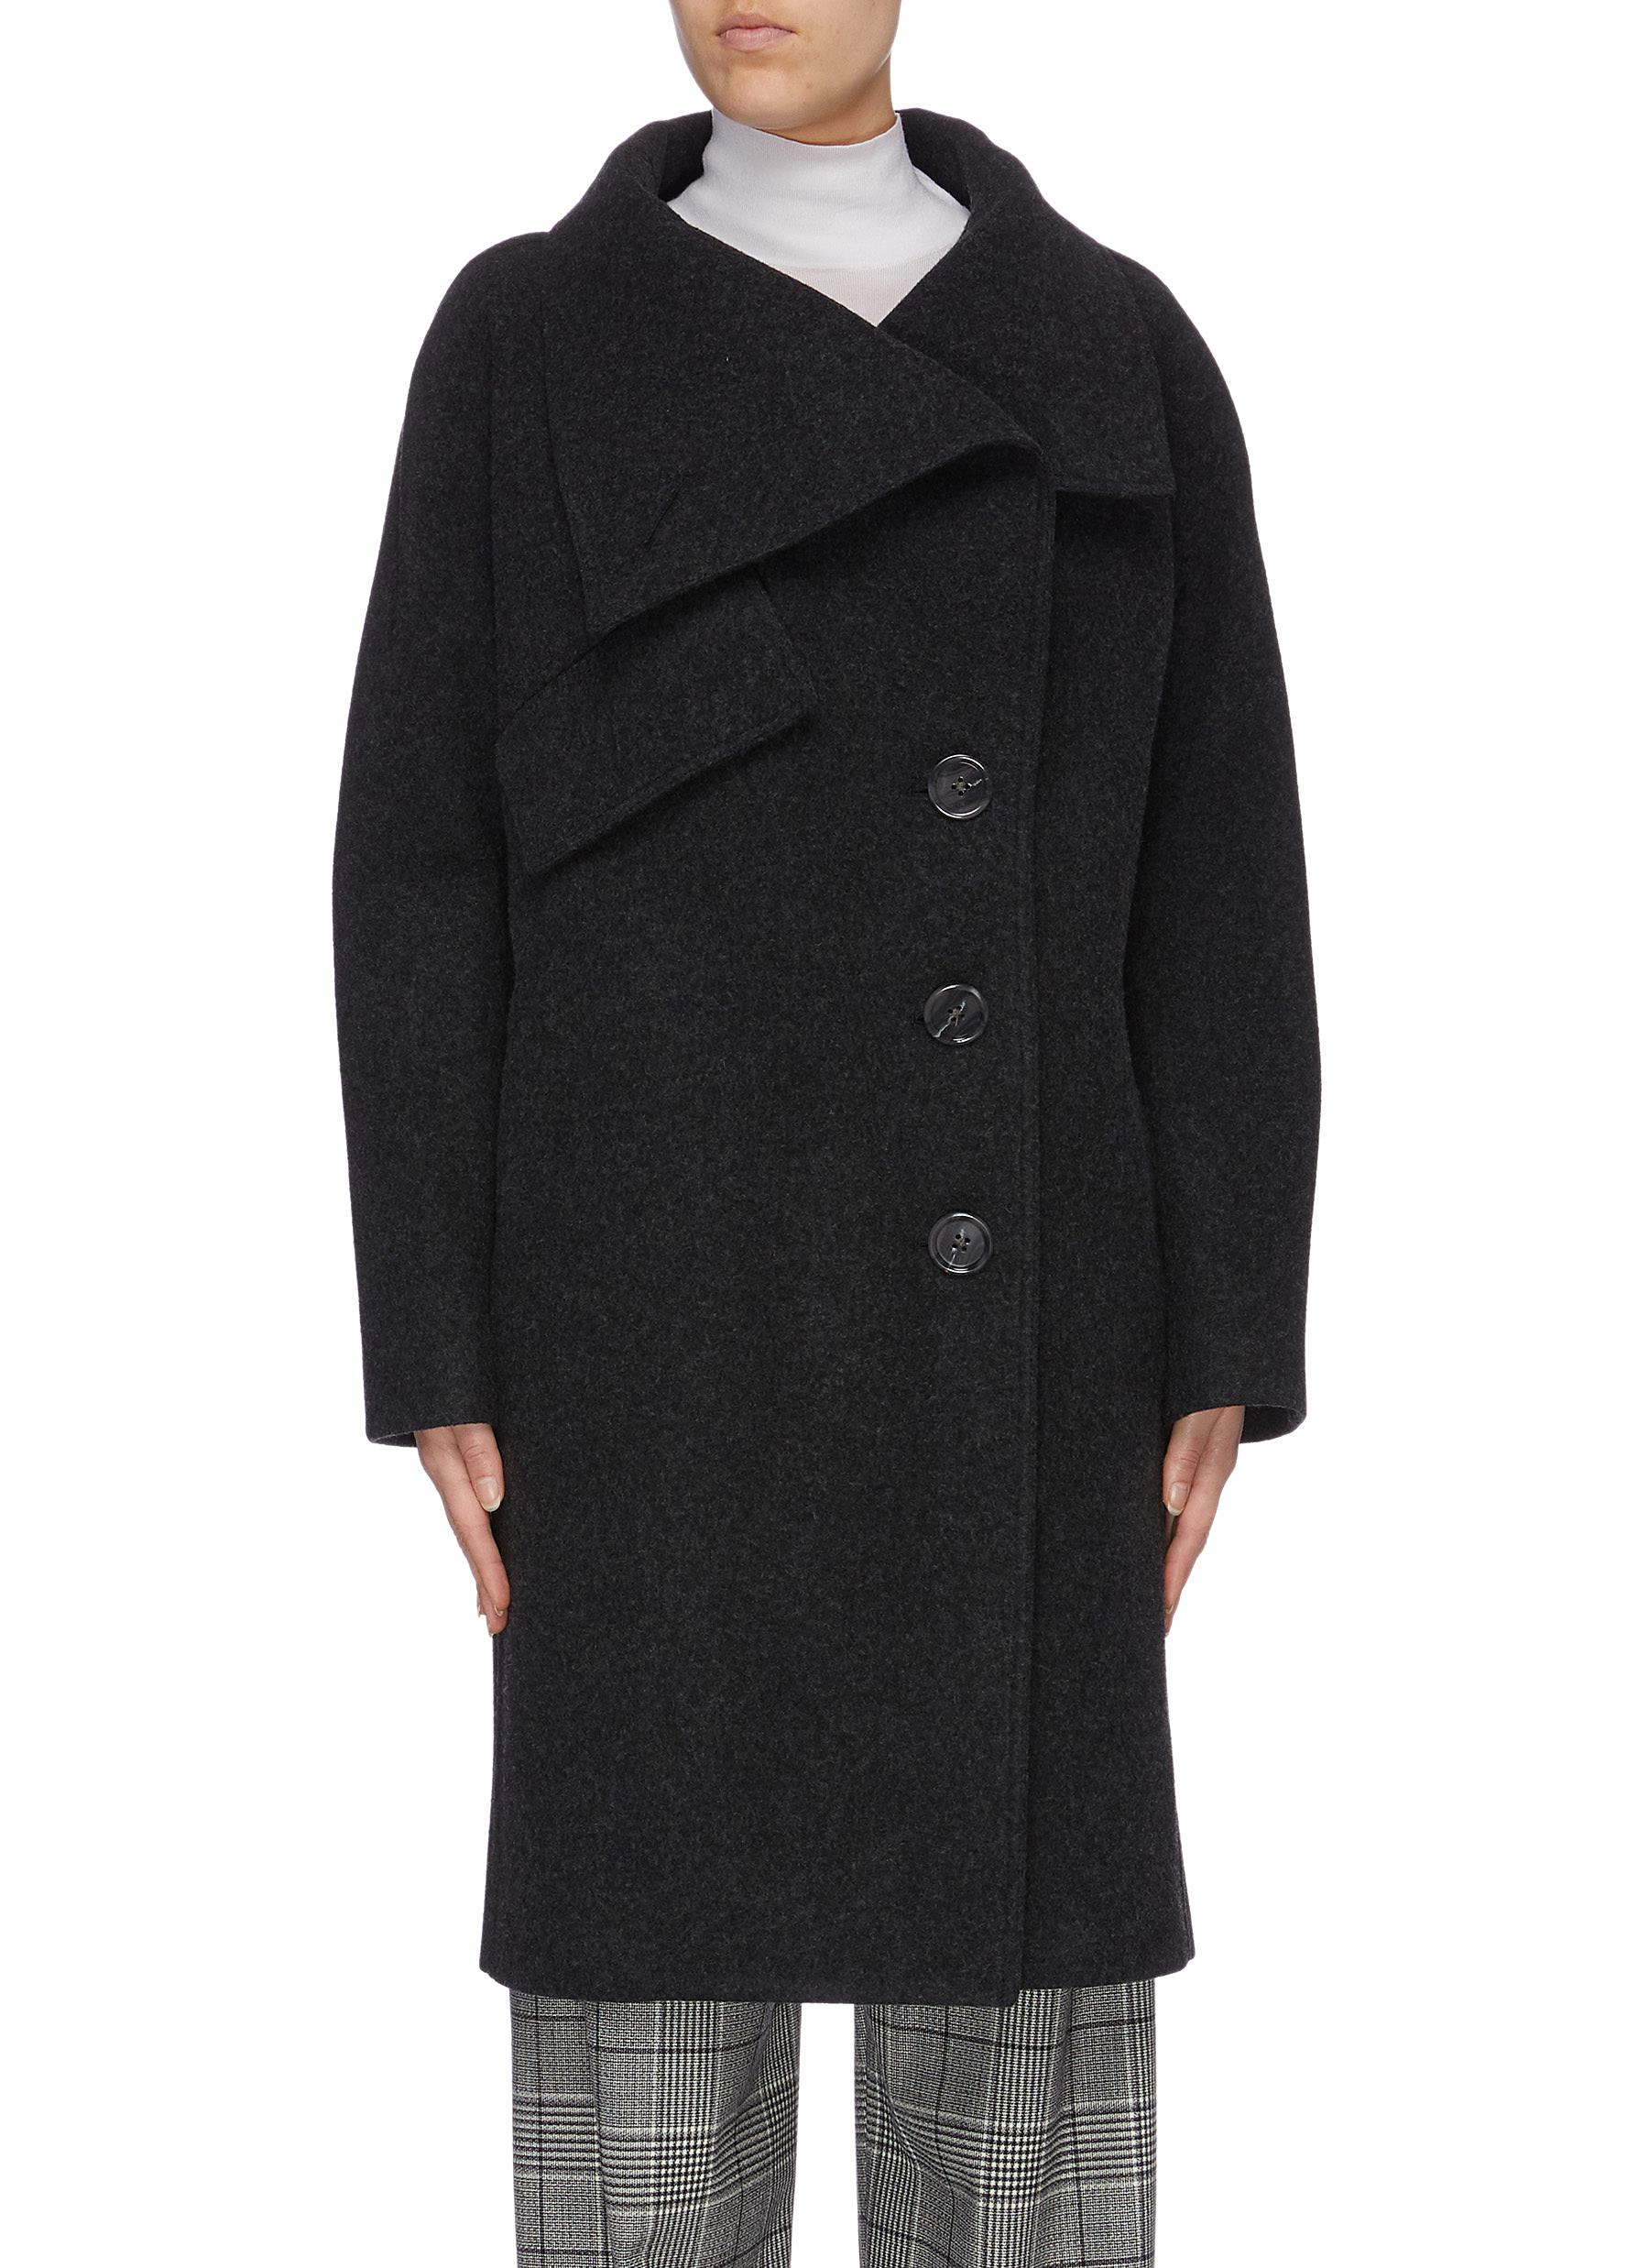 Melton coat by Acne Studios